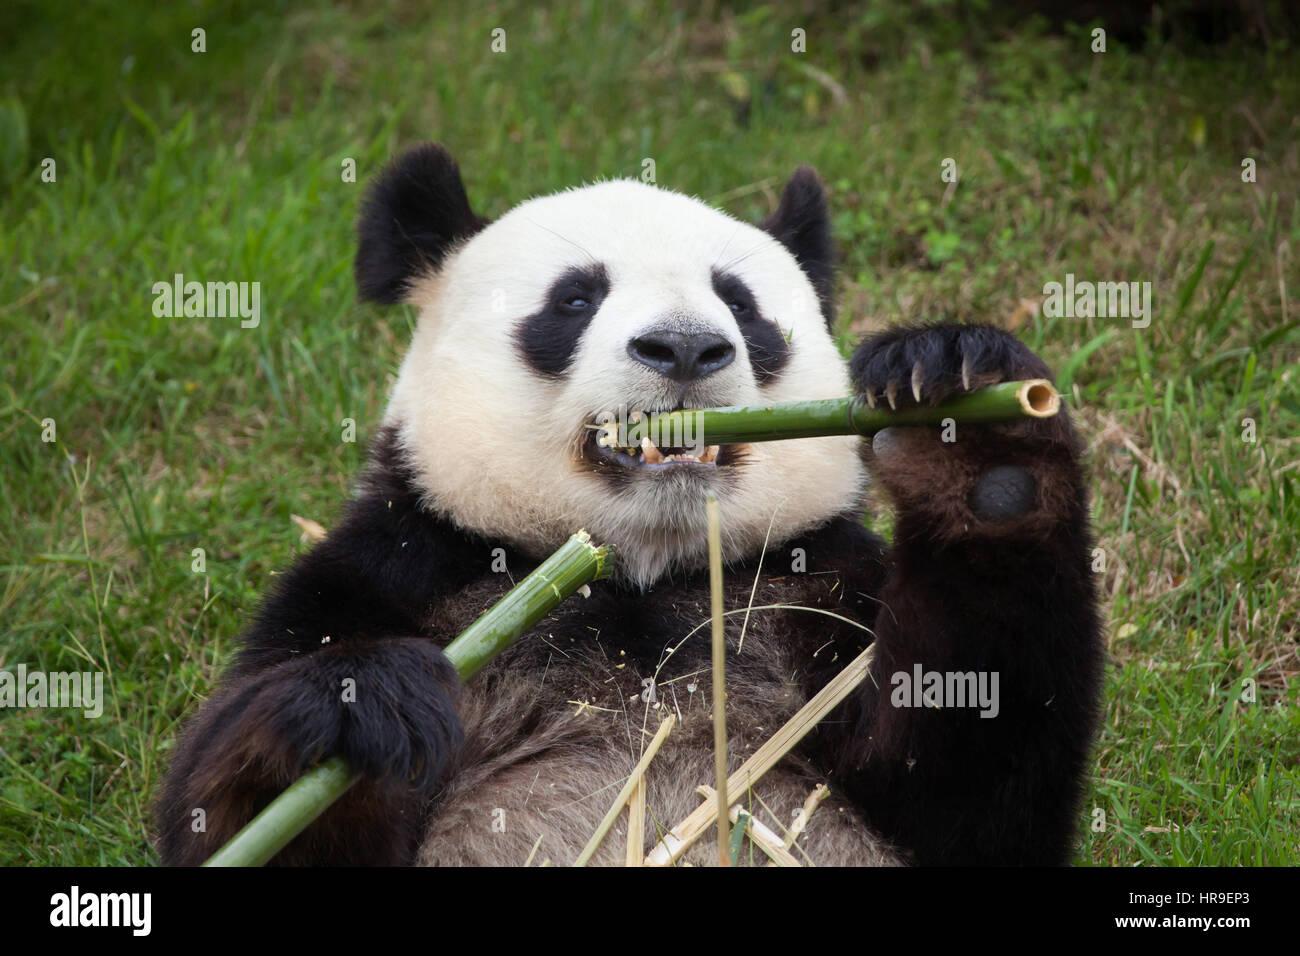 Giant panda (Ailuropoda melanoleuca) at Beauval Zoo in Saint-Aignan sur Cher, Loir-et-Cher, France. - Stock Image